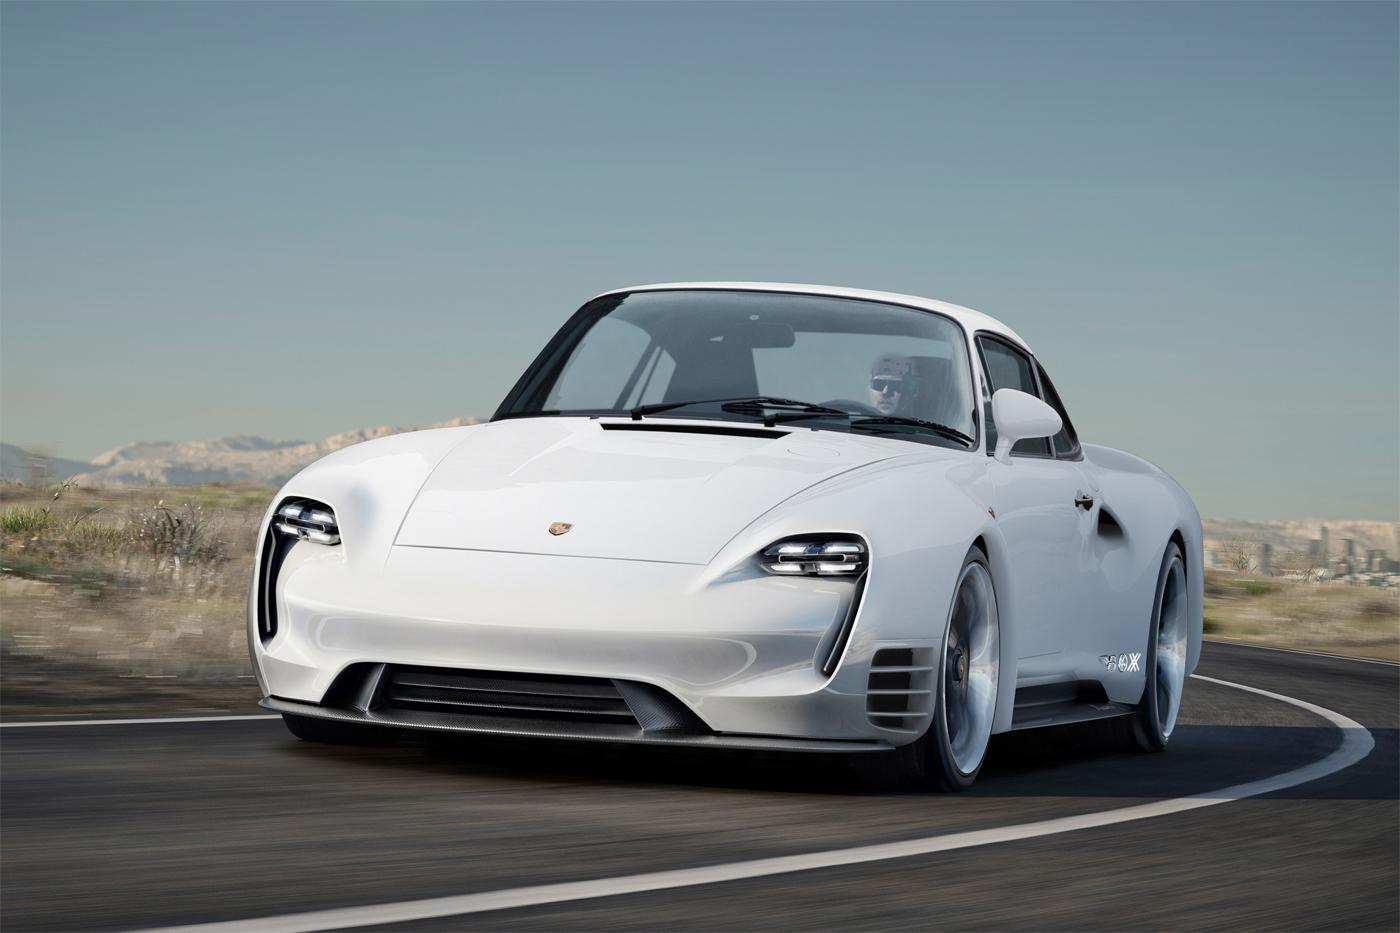 Porsche 959 Meets Mission E in Bewitching Retro-Futuristic Mashup ...